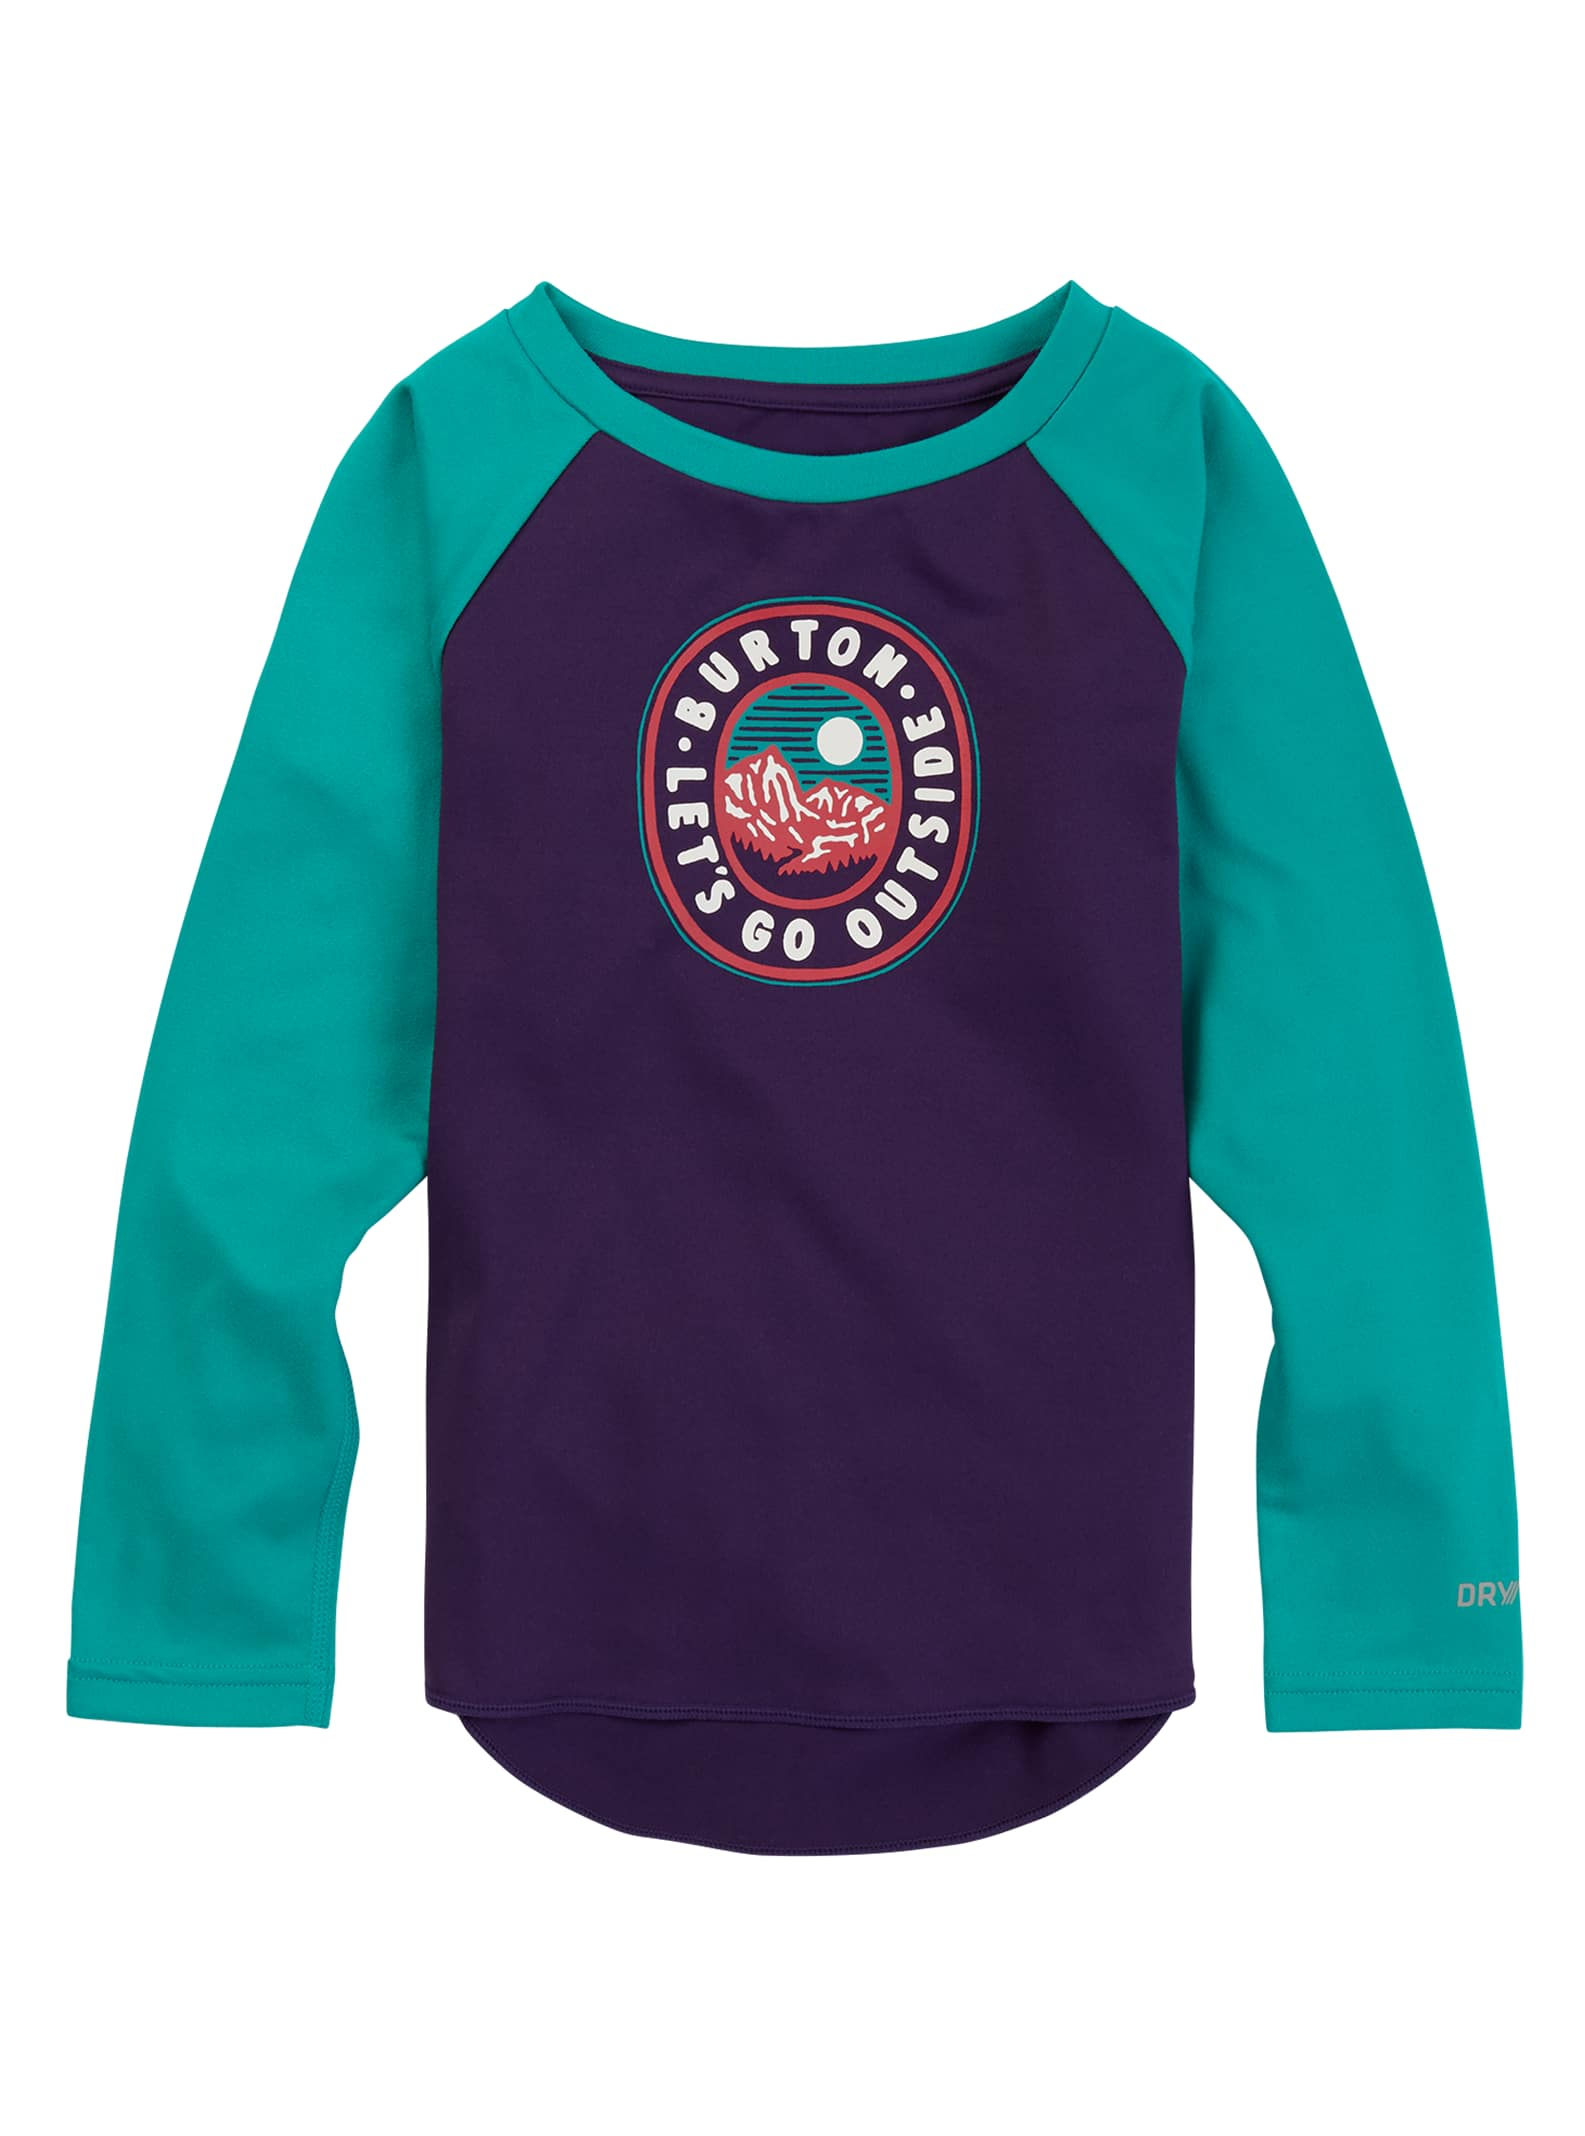 General Clothing Burton Toddlers' Midweight Base Layer Tech T-Shirt, 4T